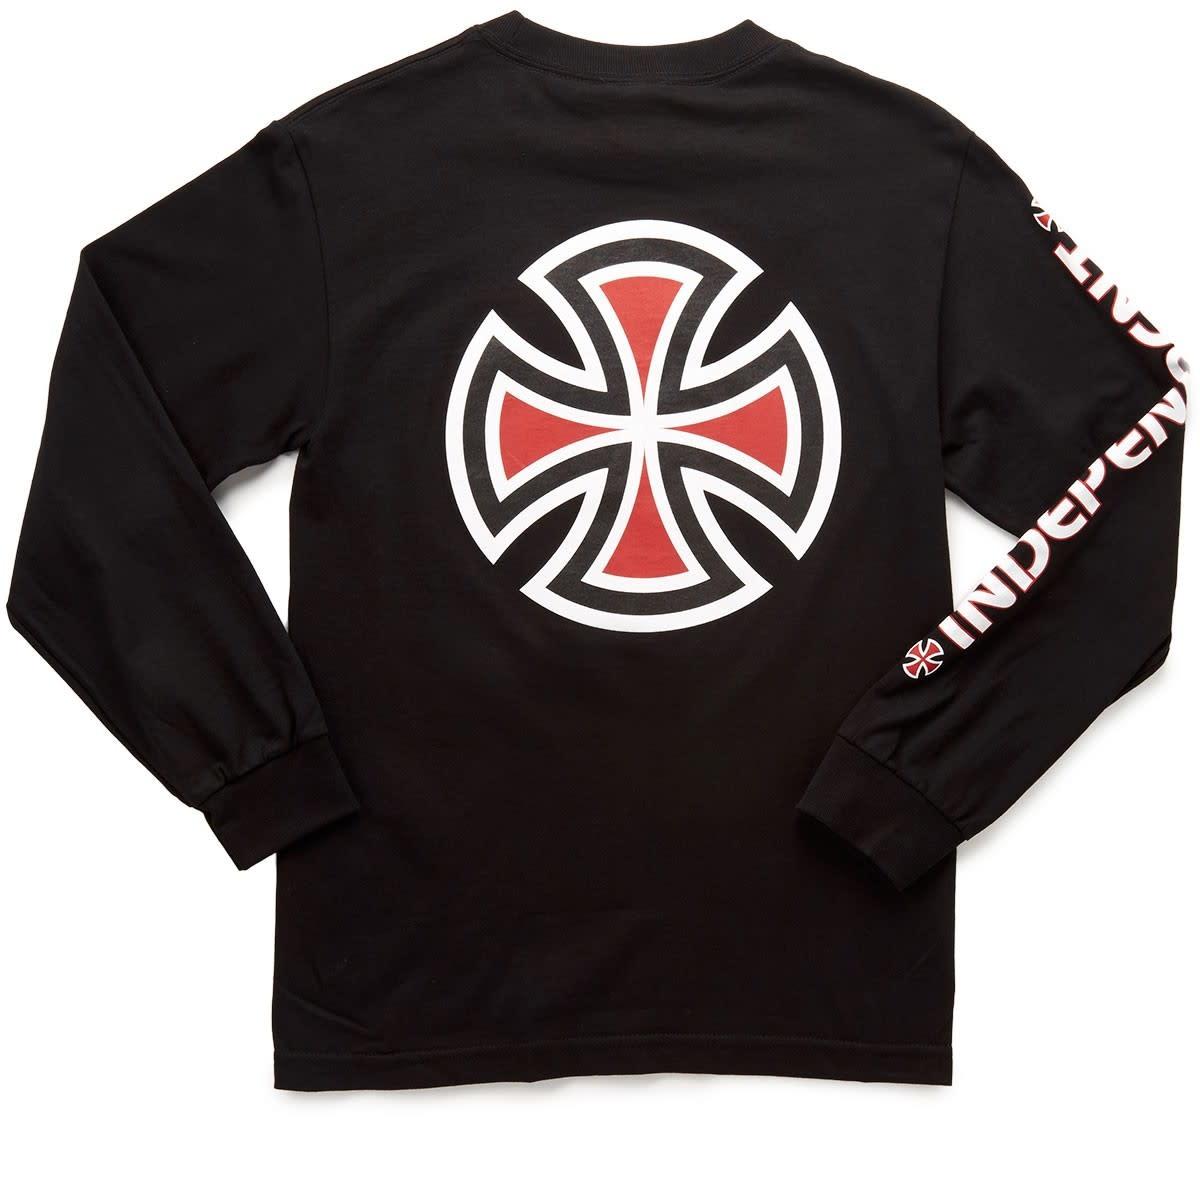 Independent Independent - Bar/Cross L/S Regular  Black